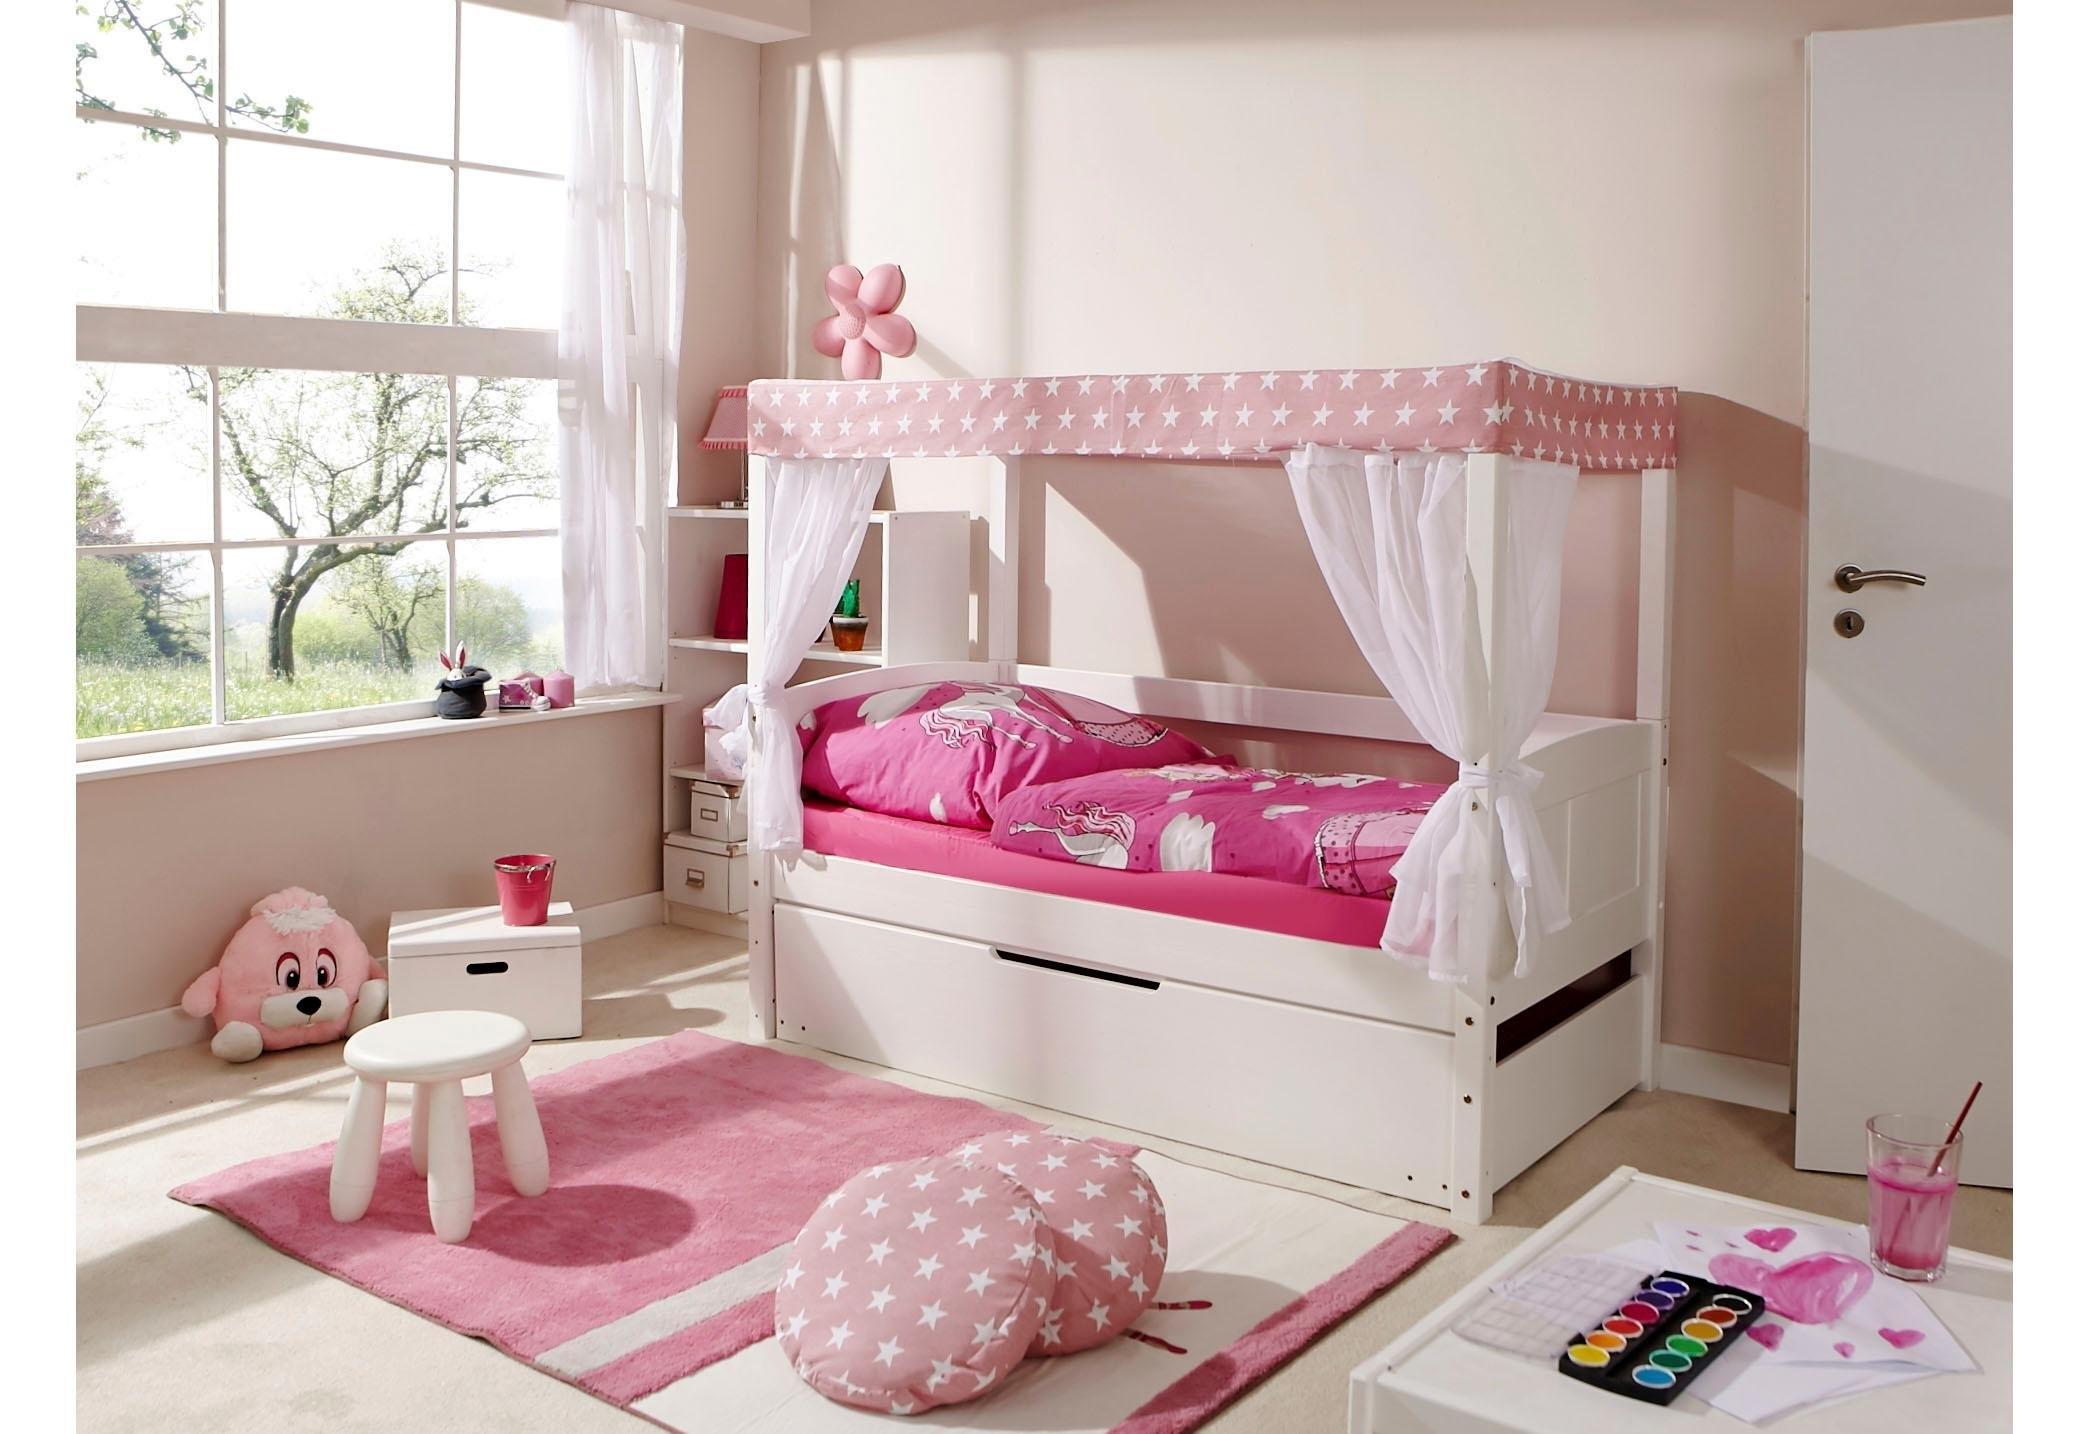 Juniorbed Met Lade.Kinderbed Met Lade Stunning Bed Met Lade Opberging En Beddenbodem